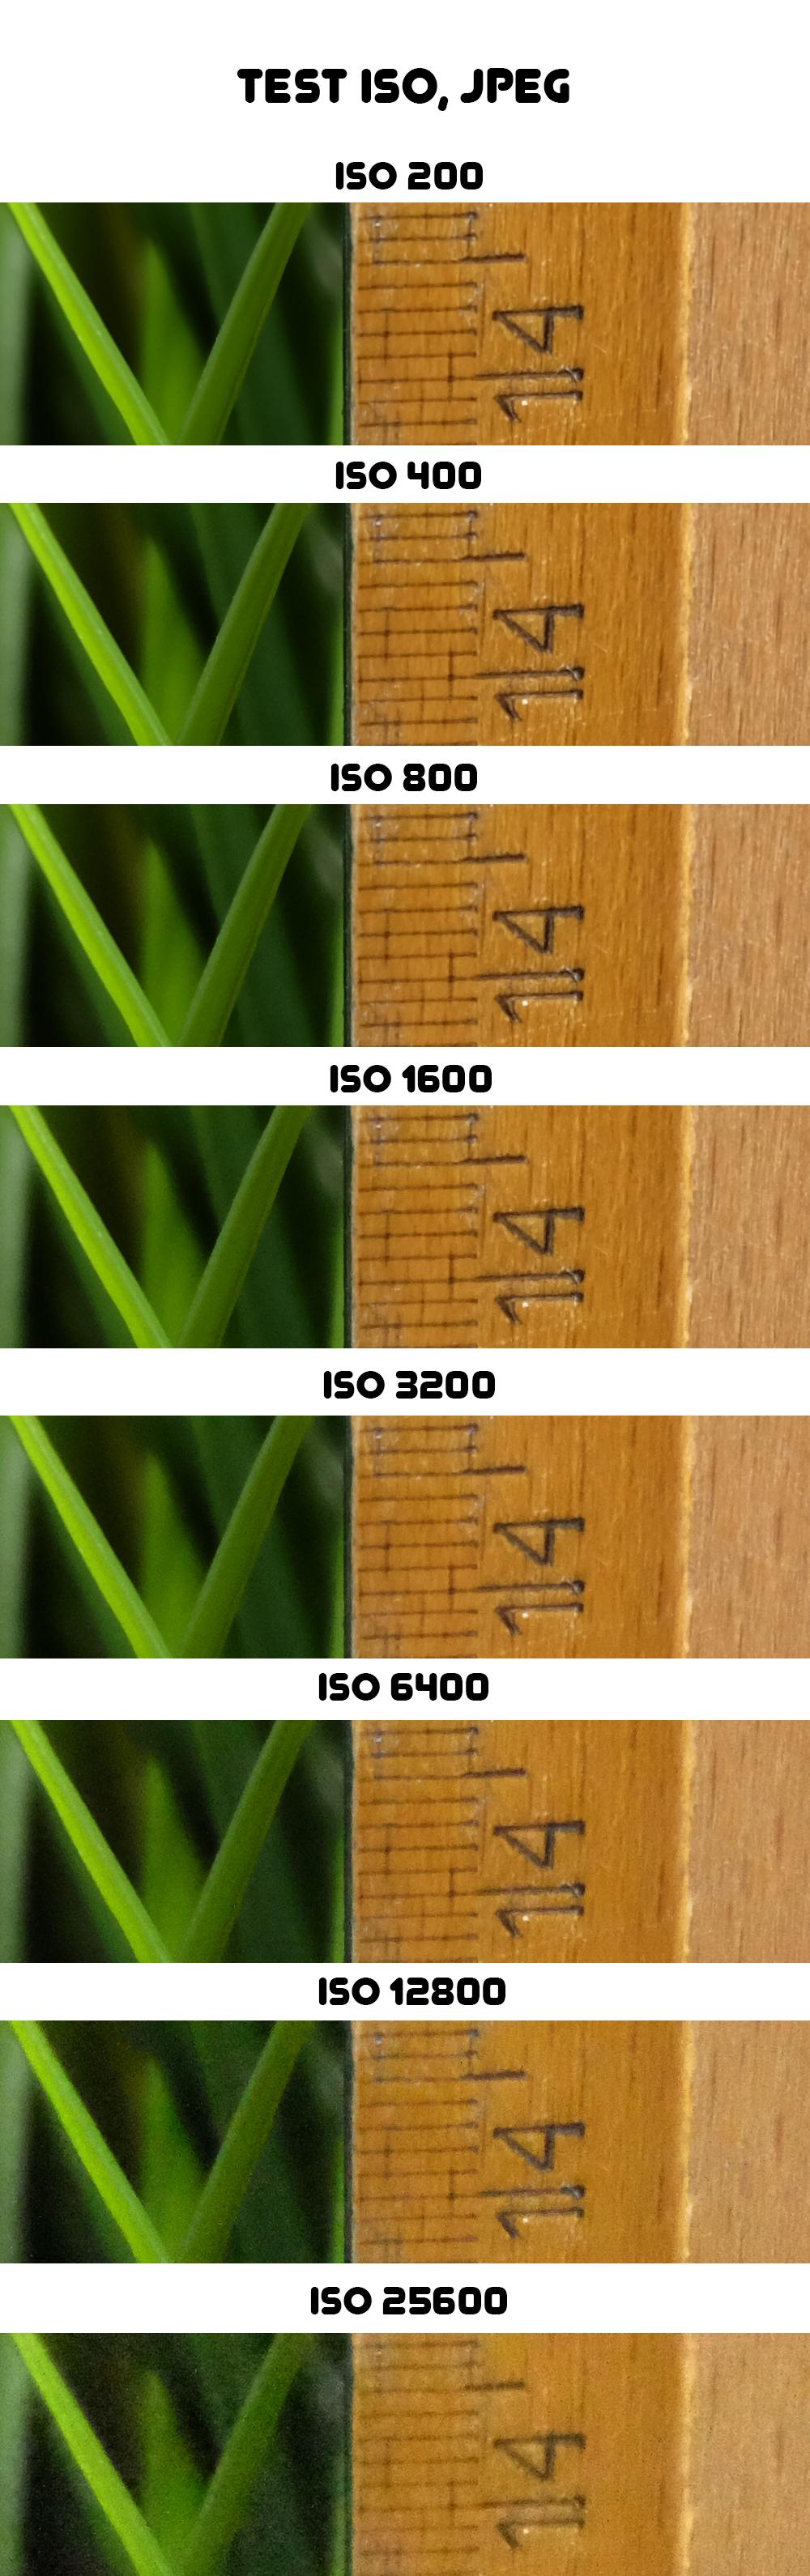 Fujifilm X-M1 - ISO, JPEG